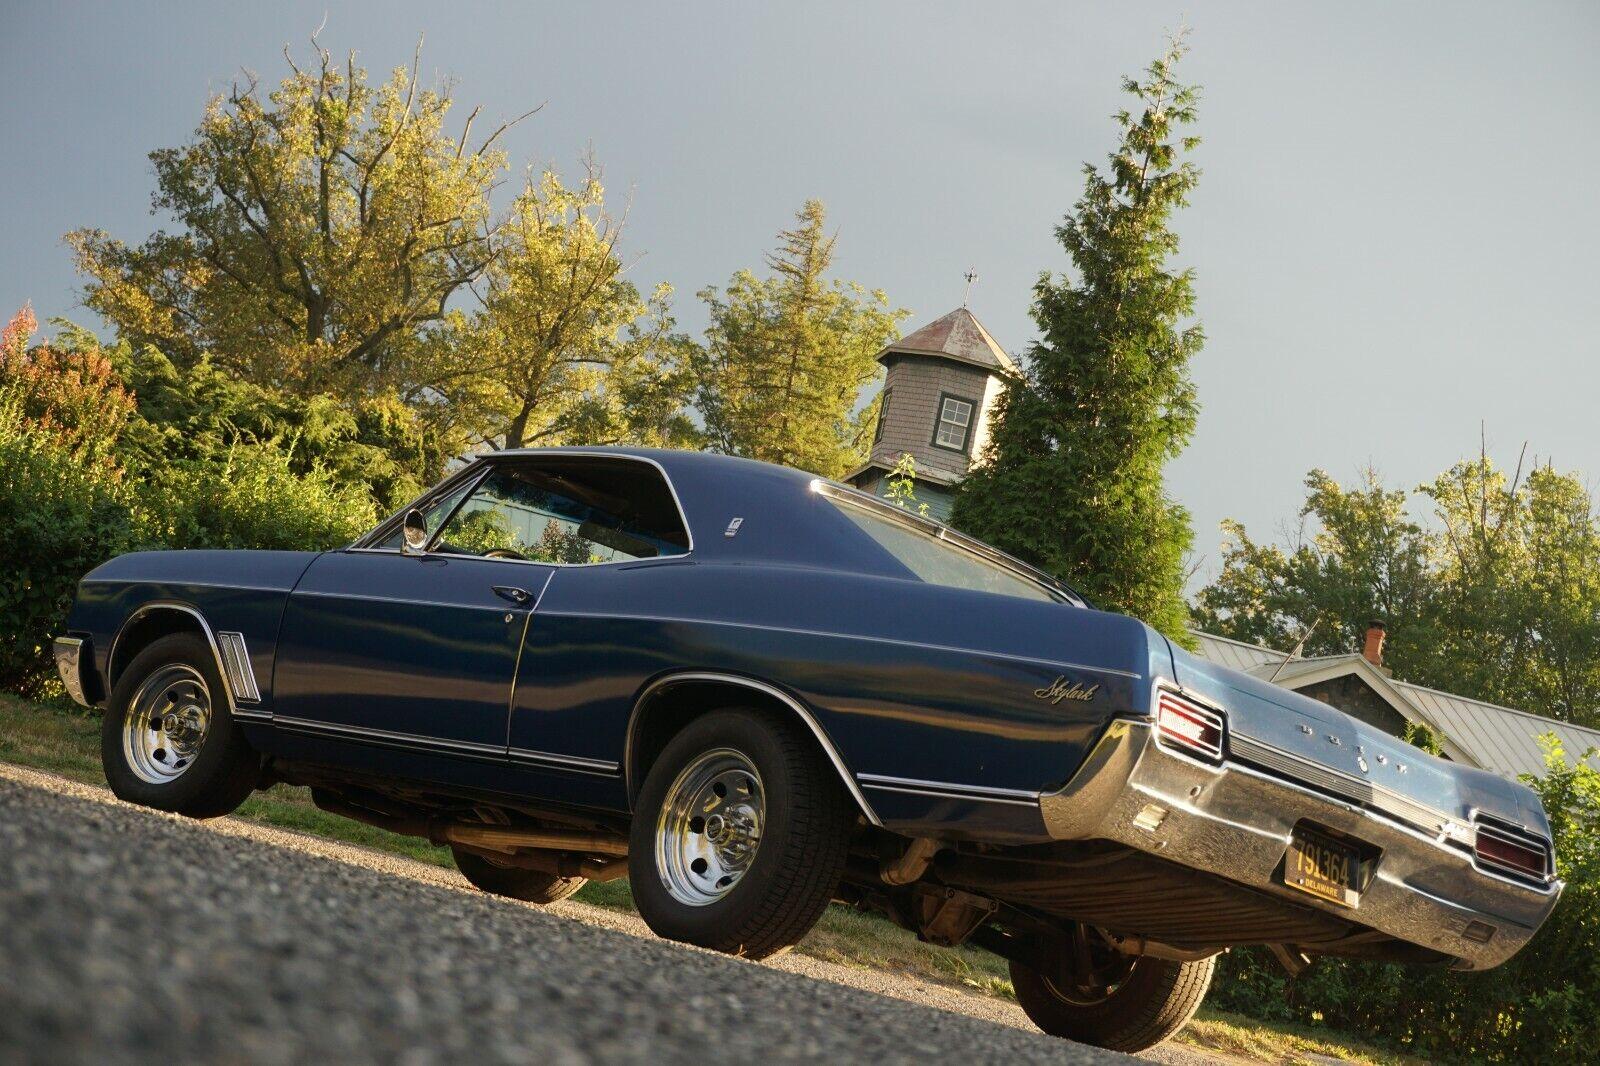 1967 buick skylark buick 455ci motor WATCH VIDEO!